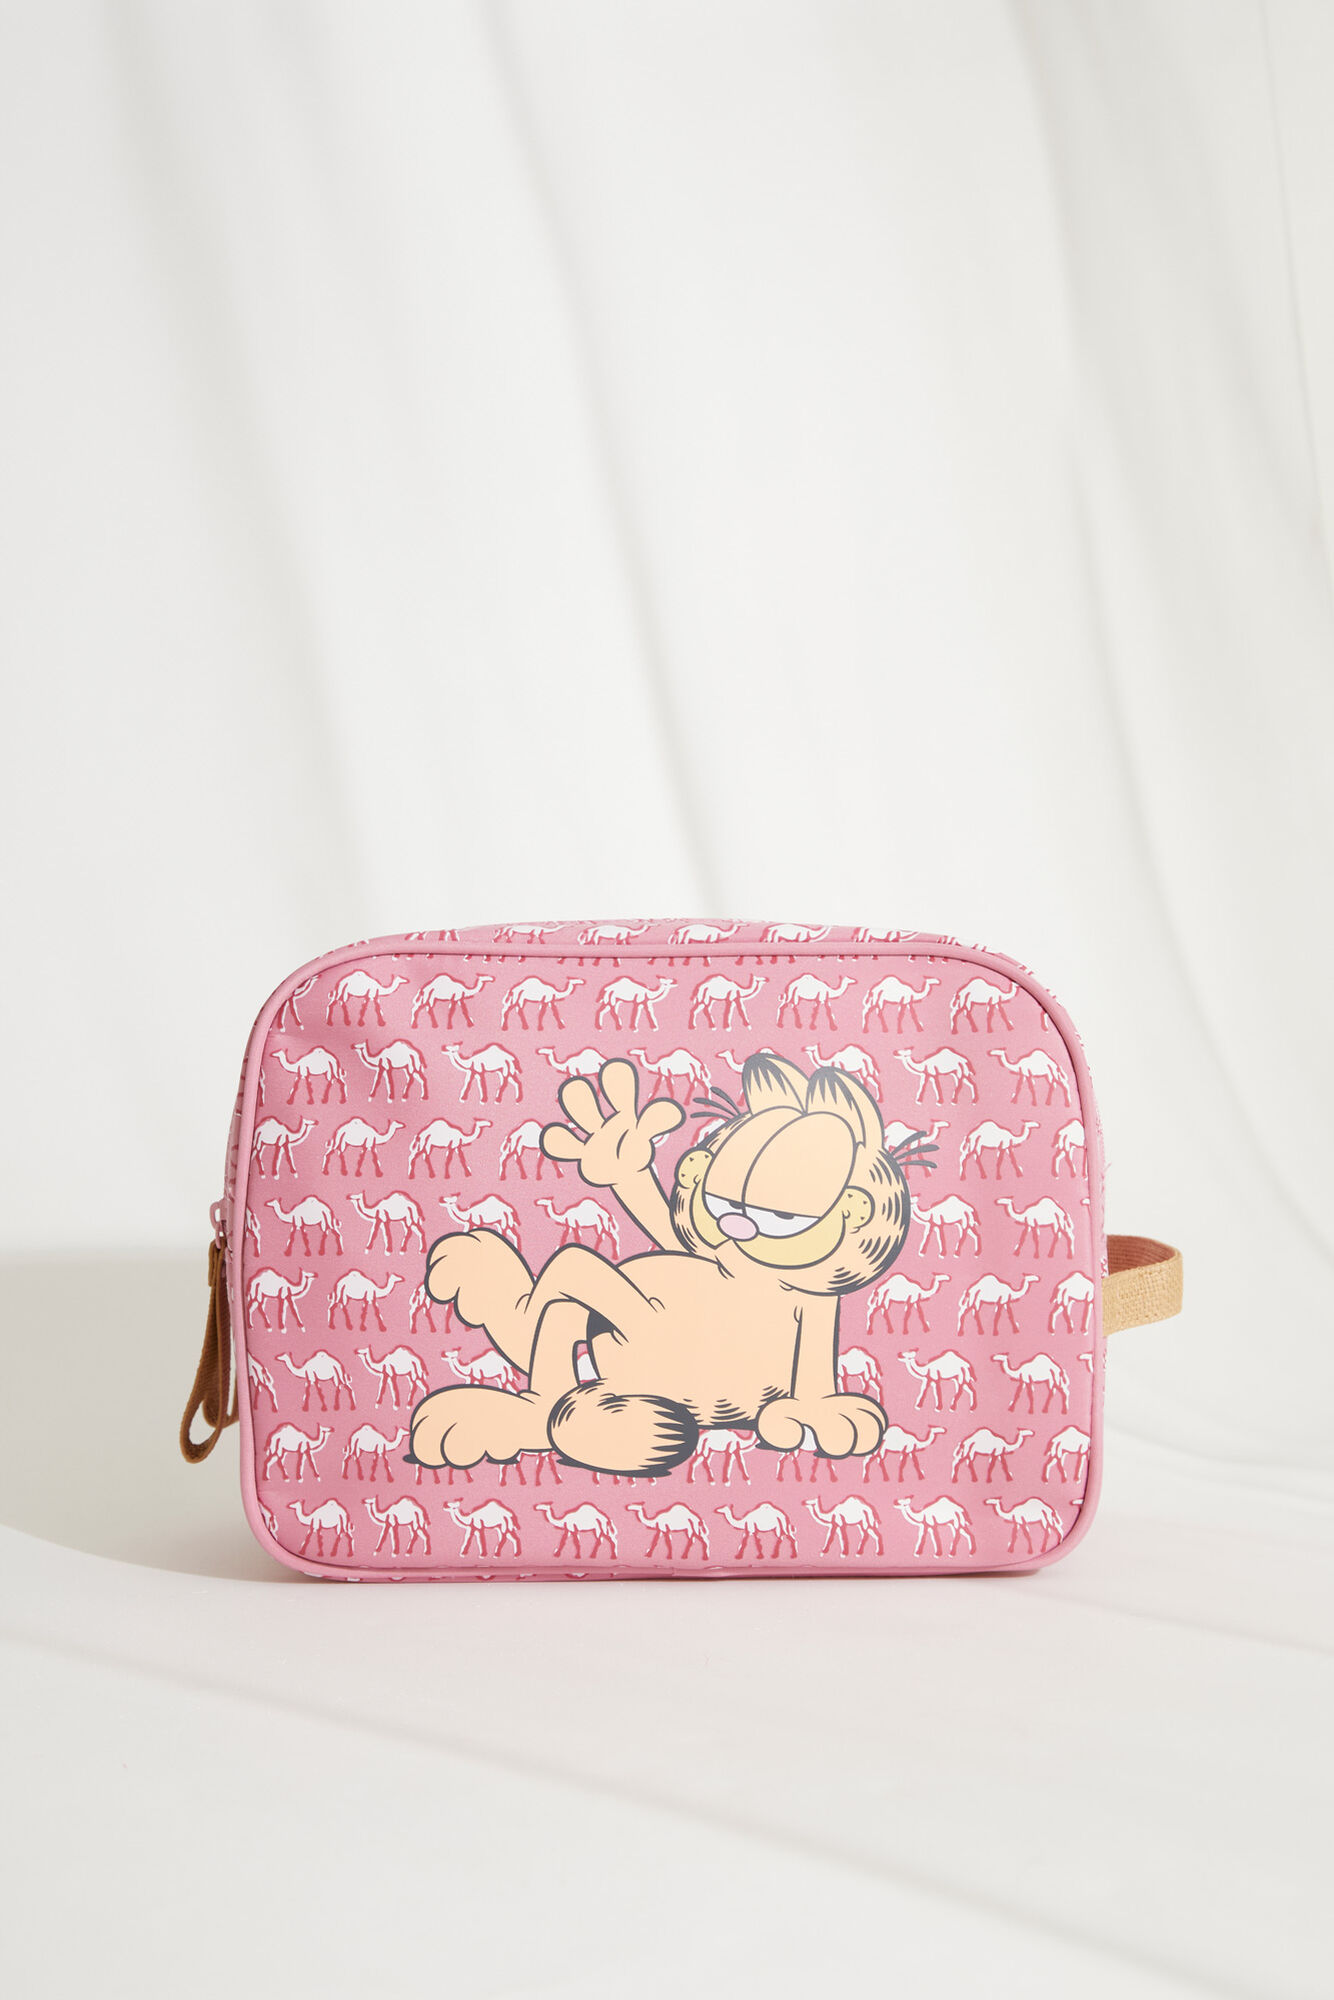 Neceser grande estuche Garfield camellos rosa